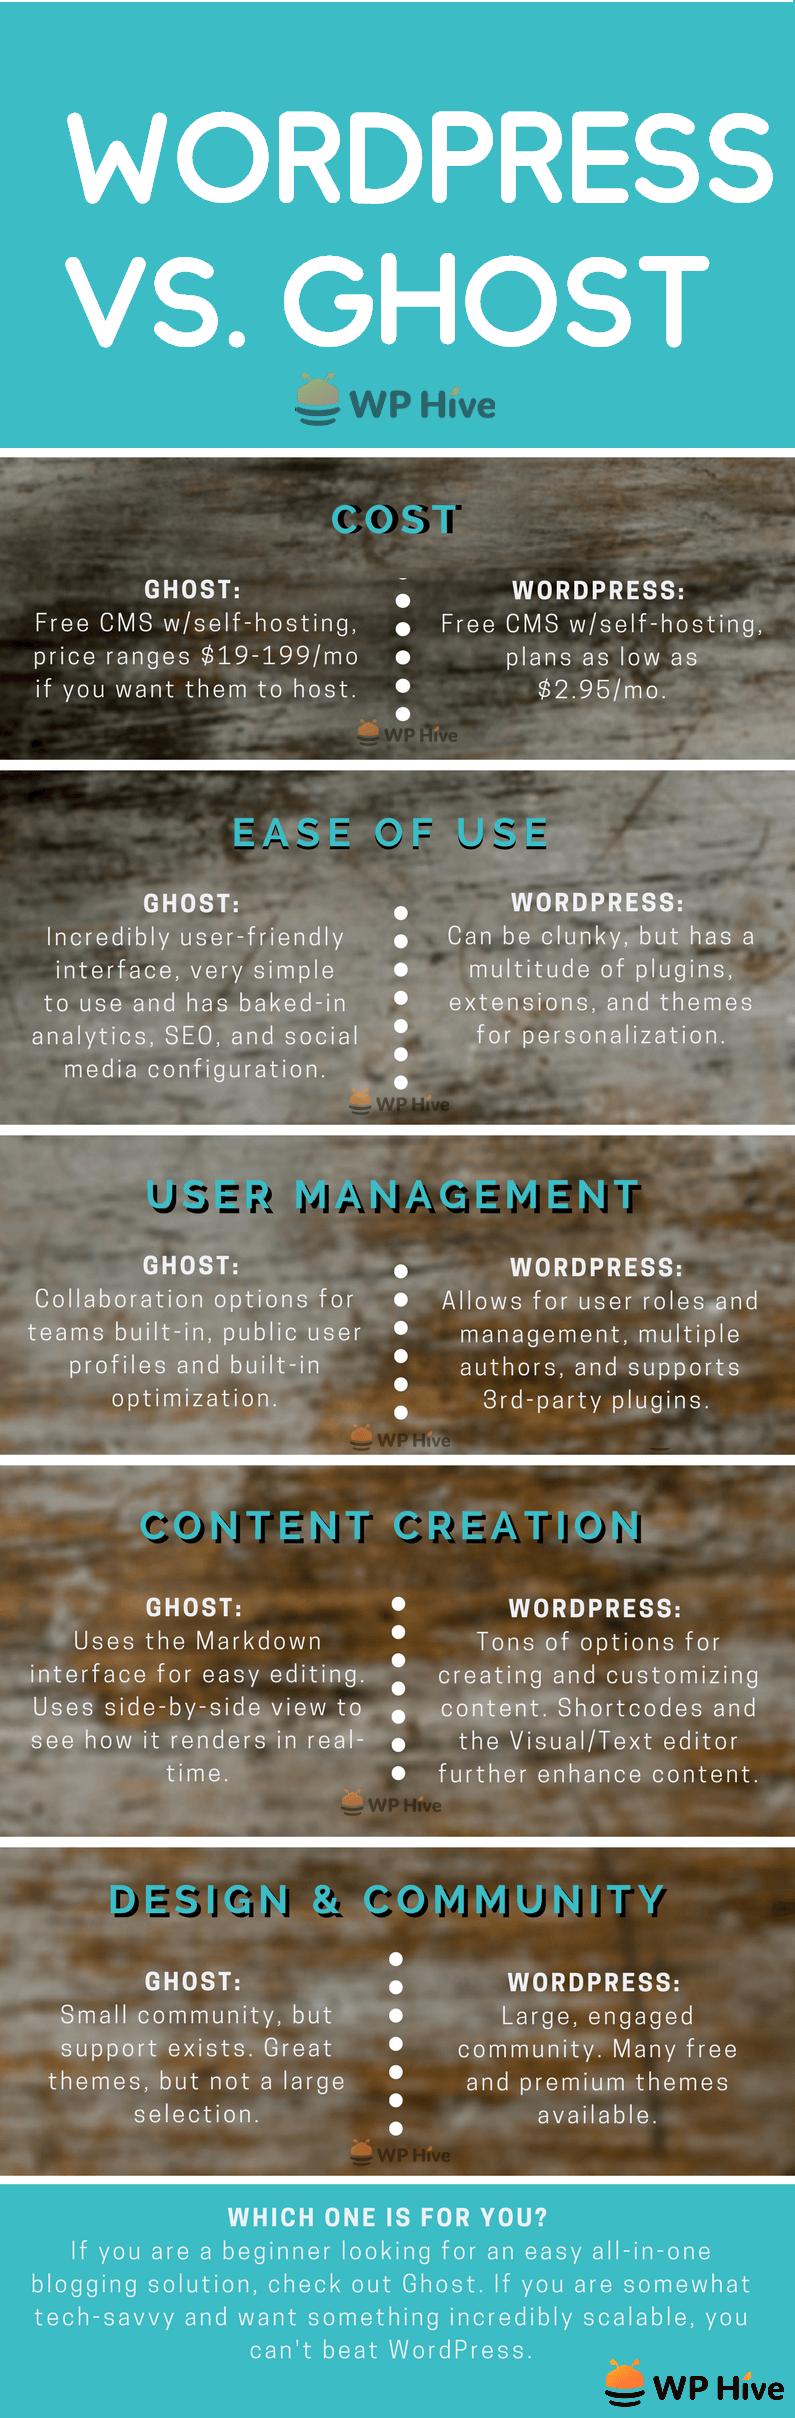 wordpress vs ghost infographic